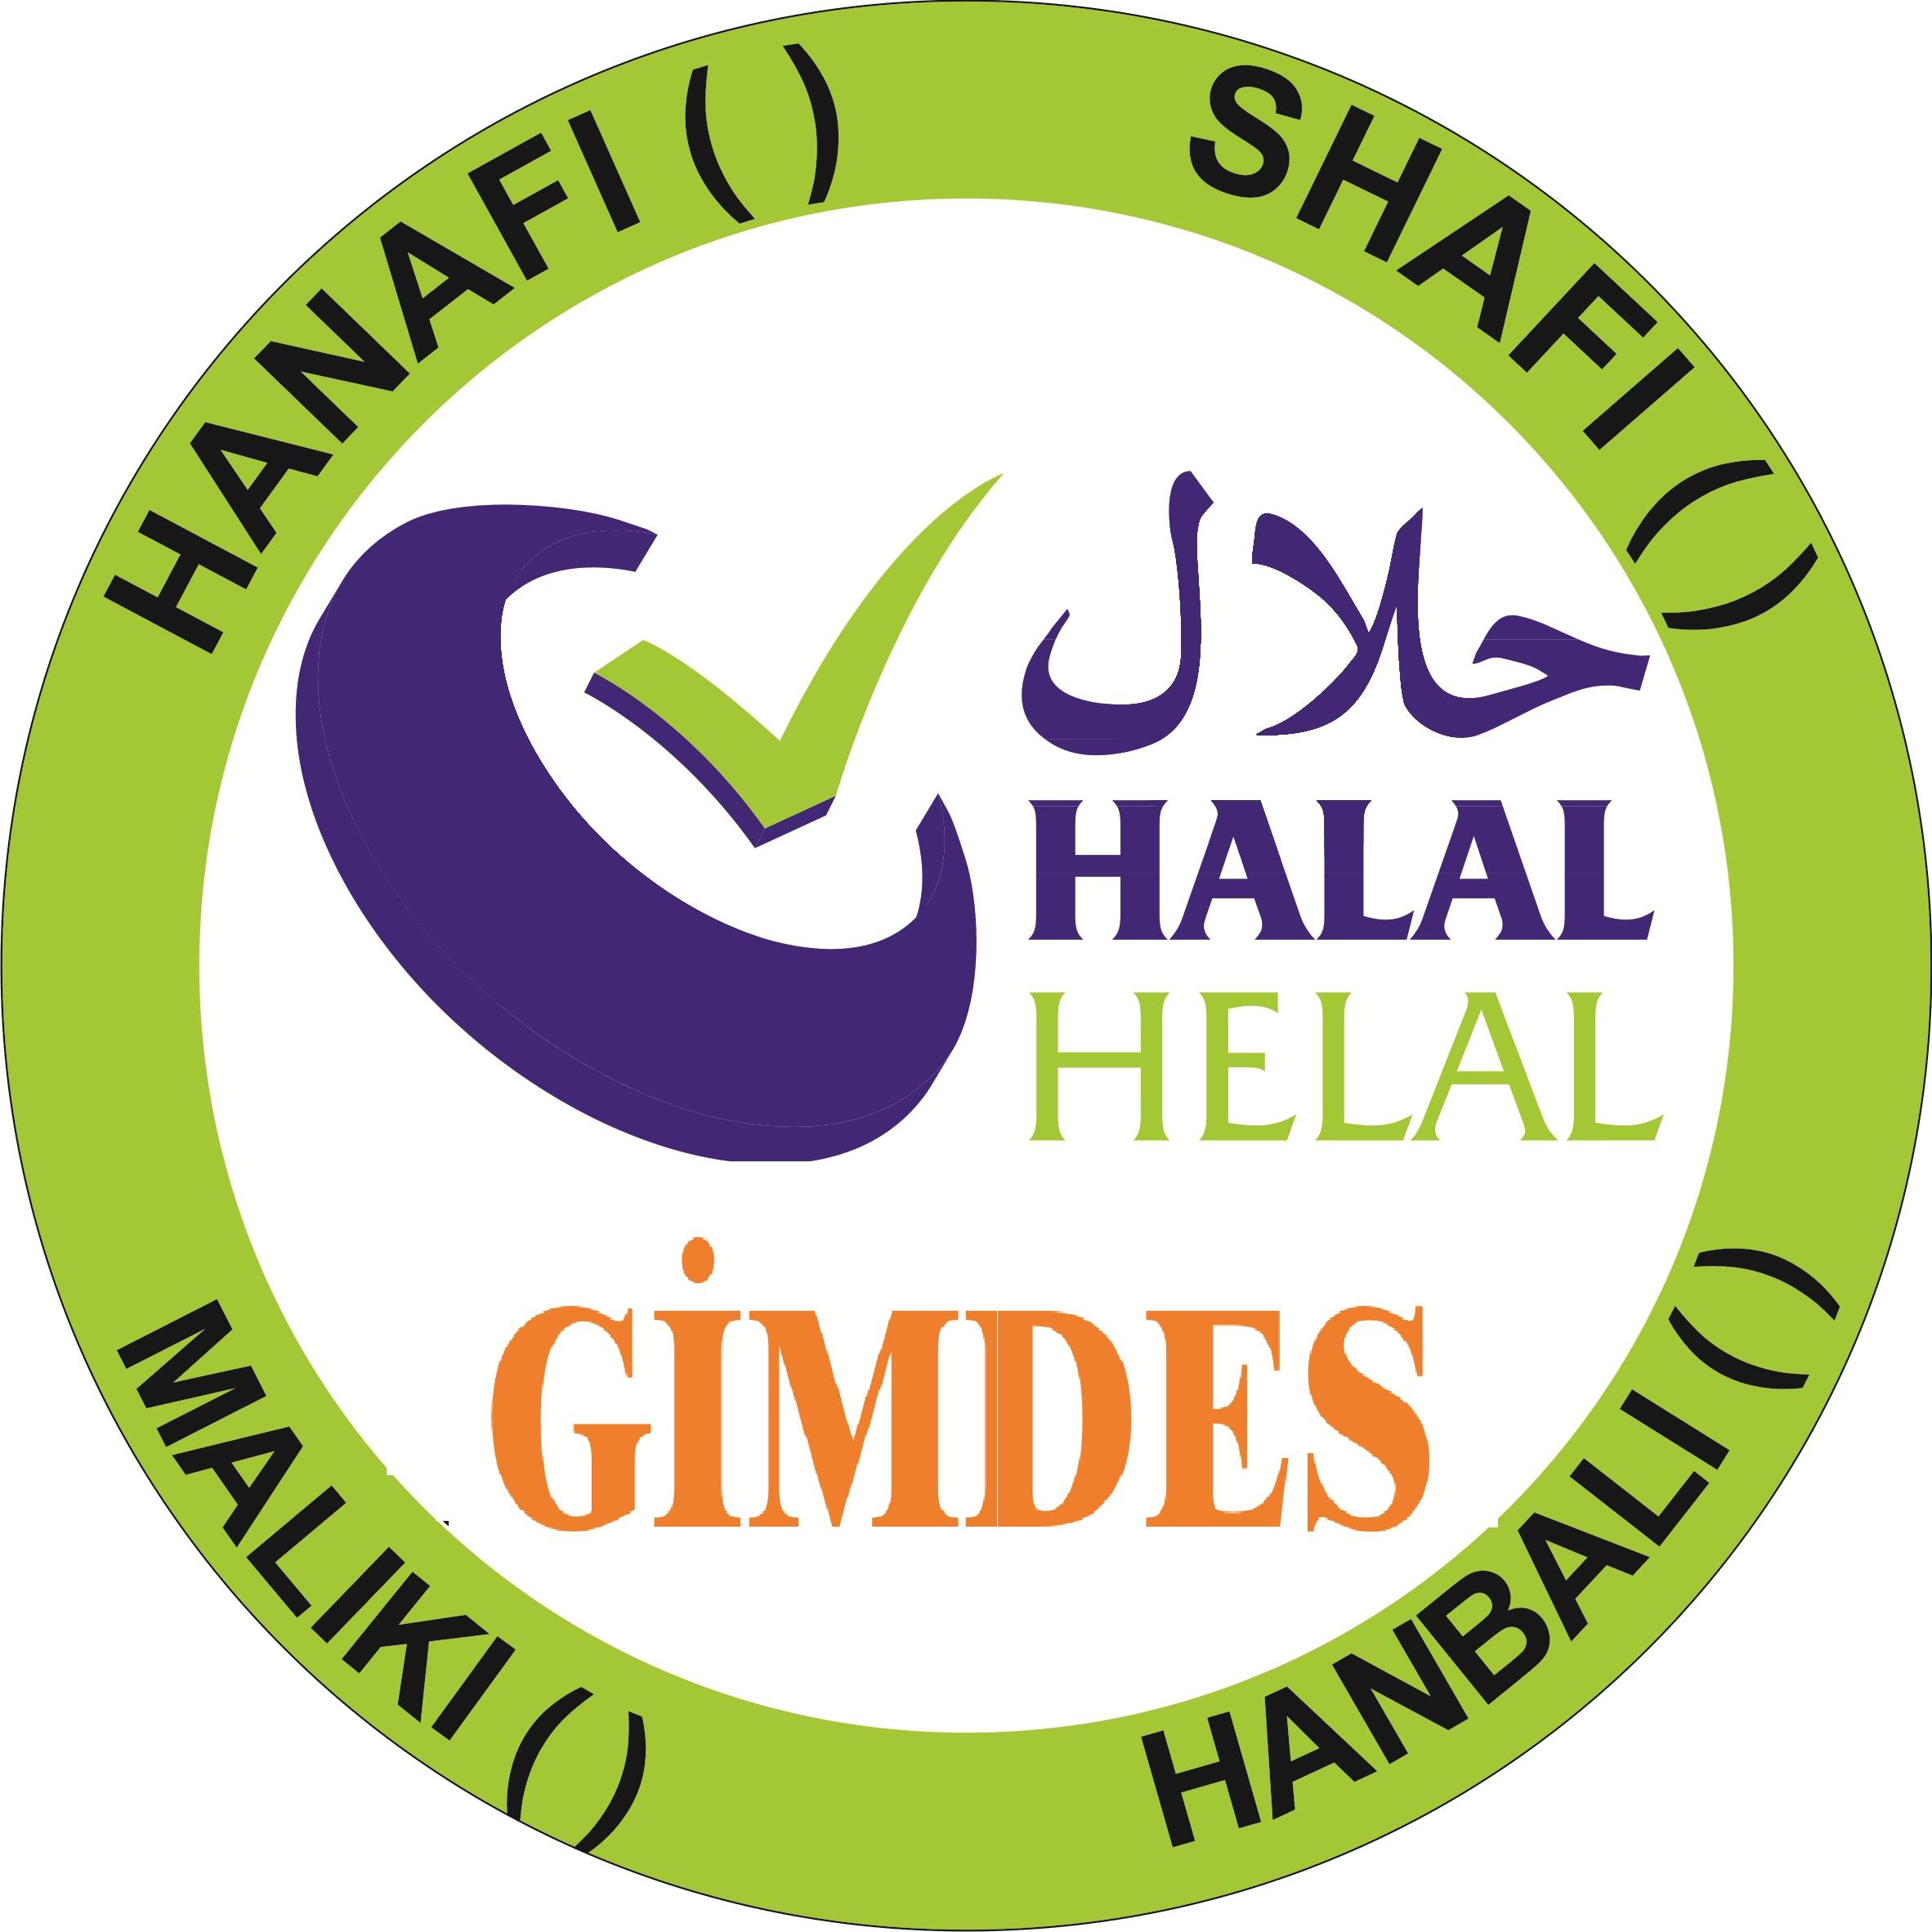 Gimdes Certification Standarts Halal Certification In Turkey